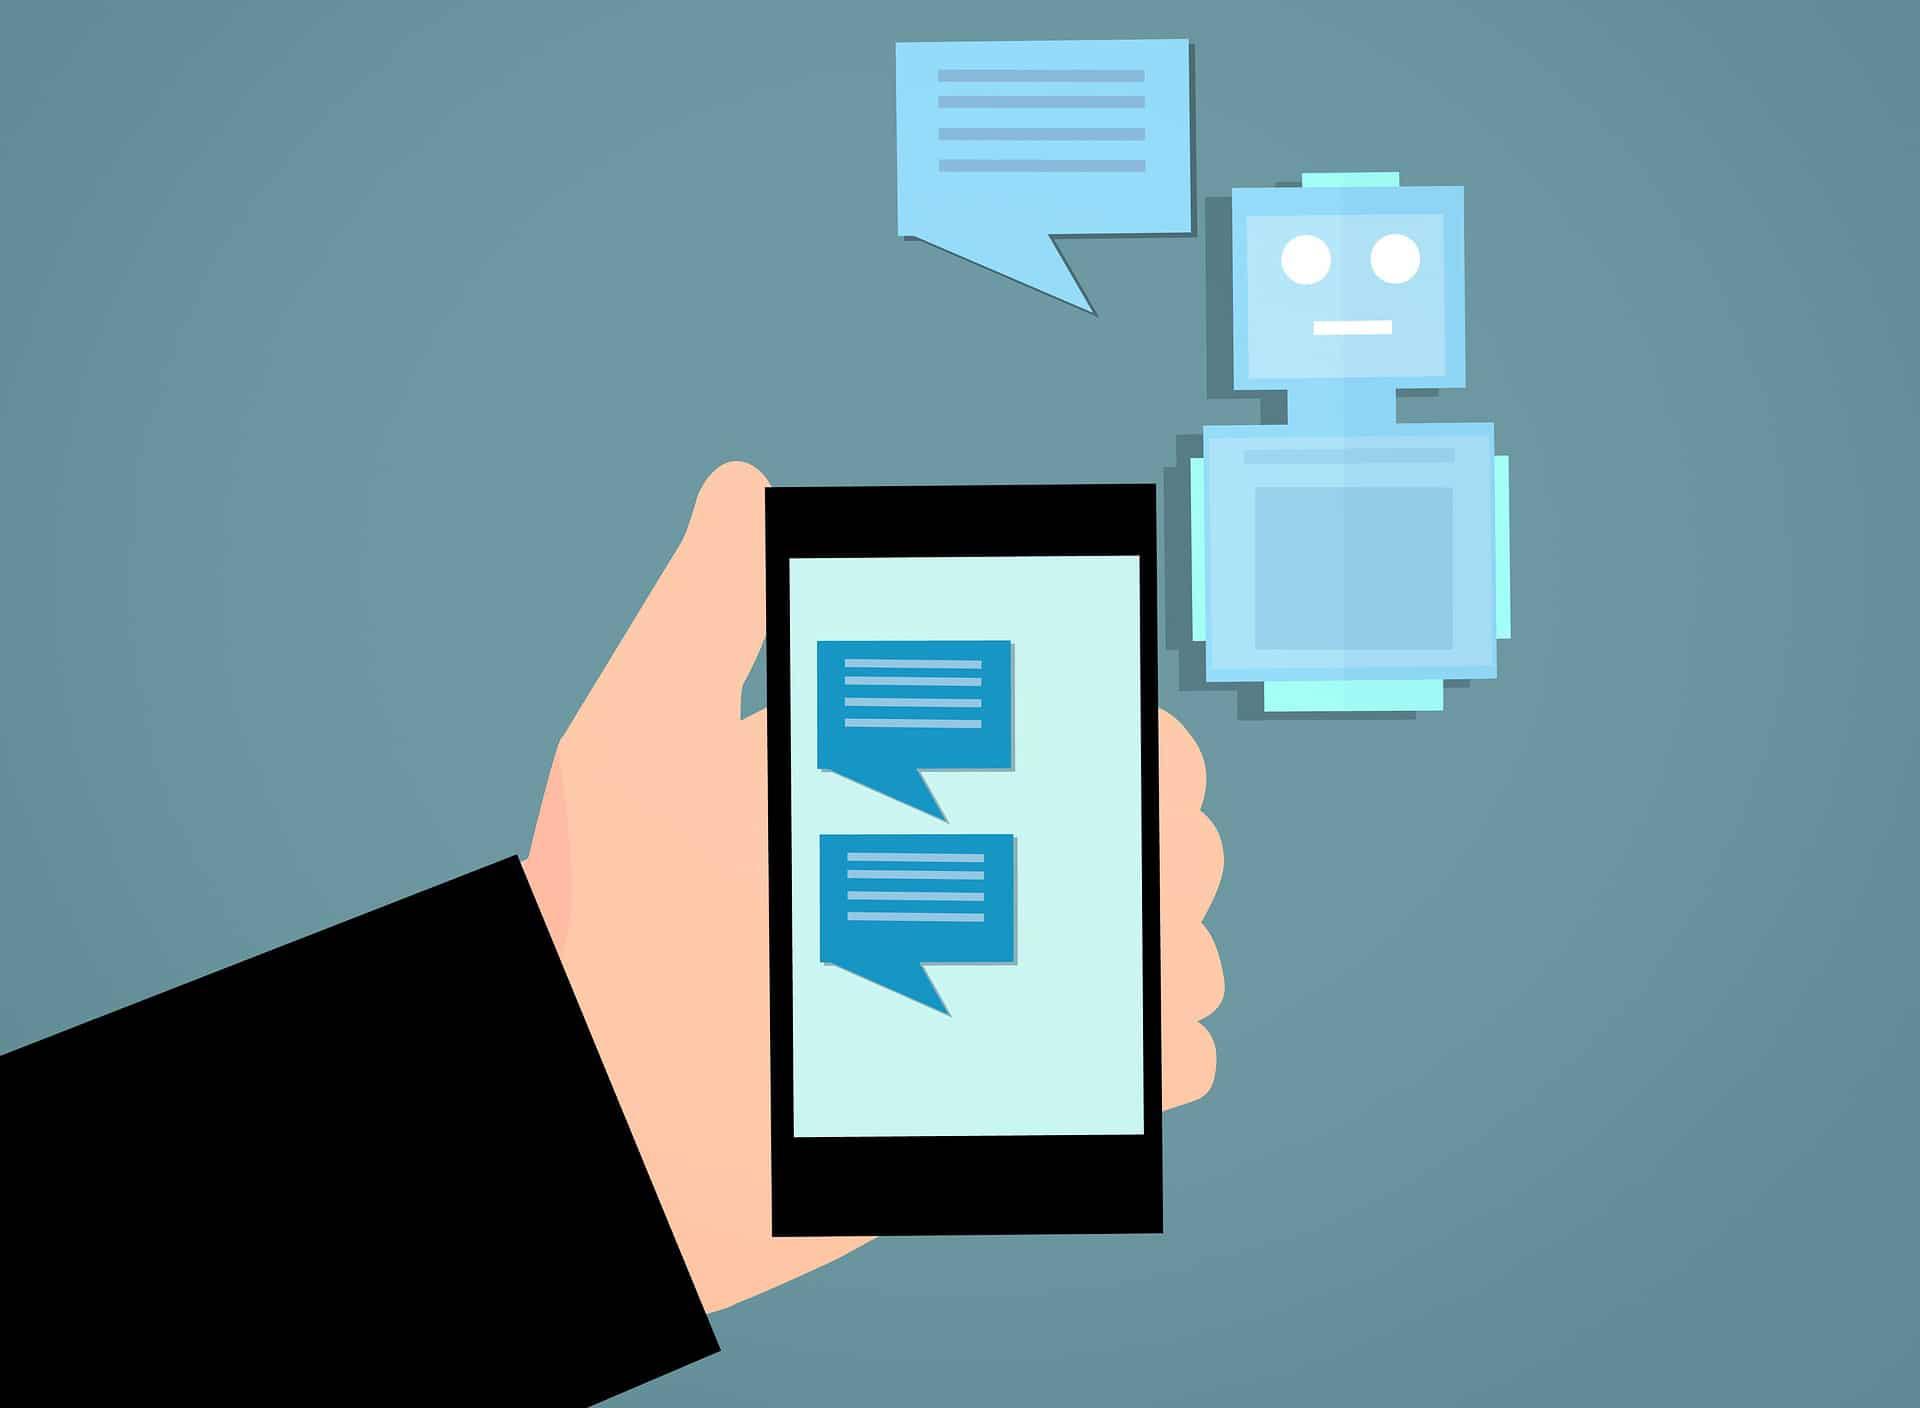 Chatbots - Instant messenger apps